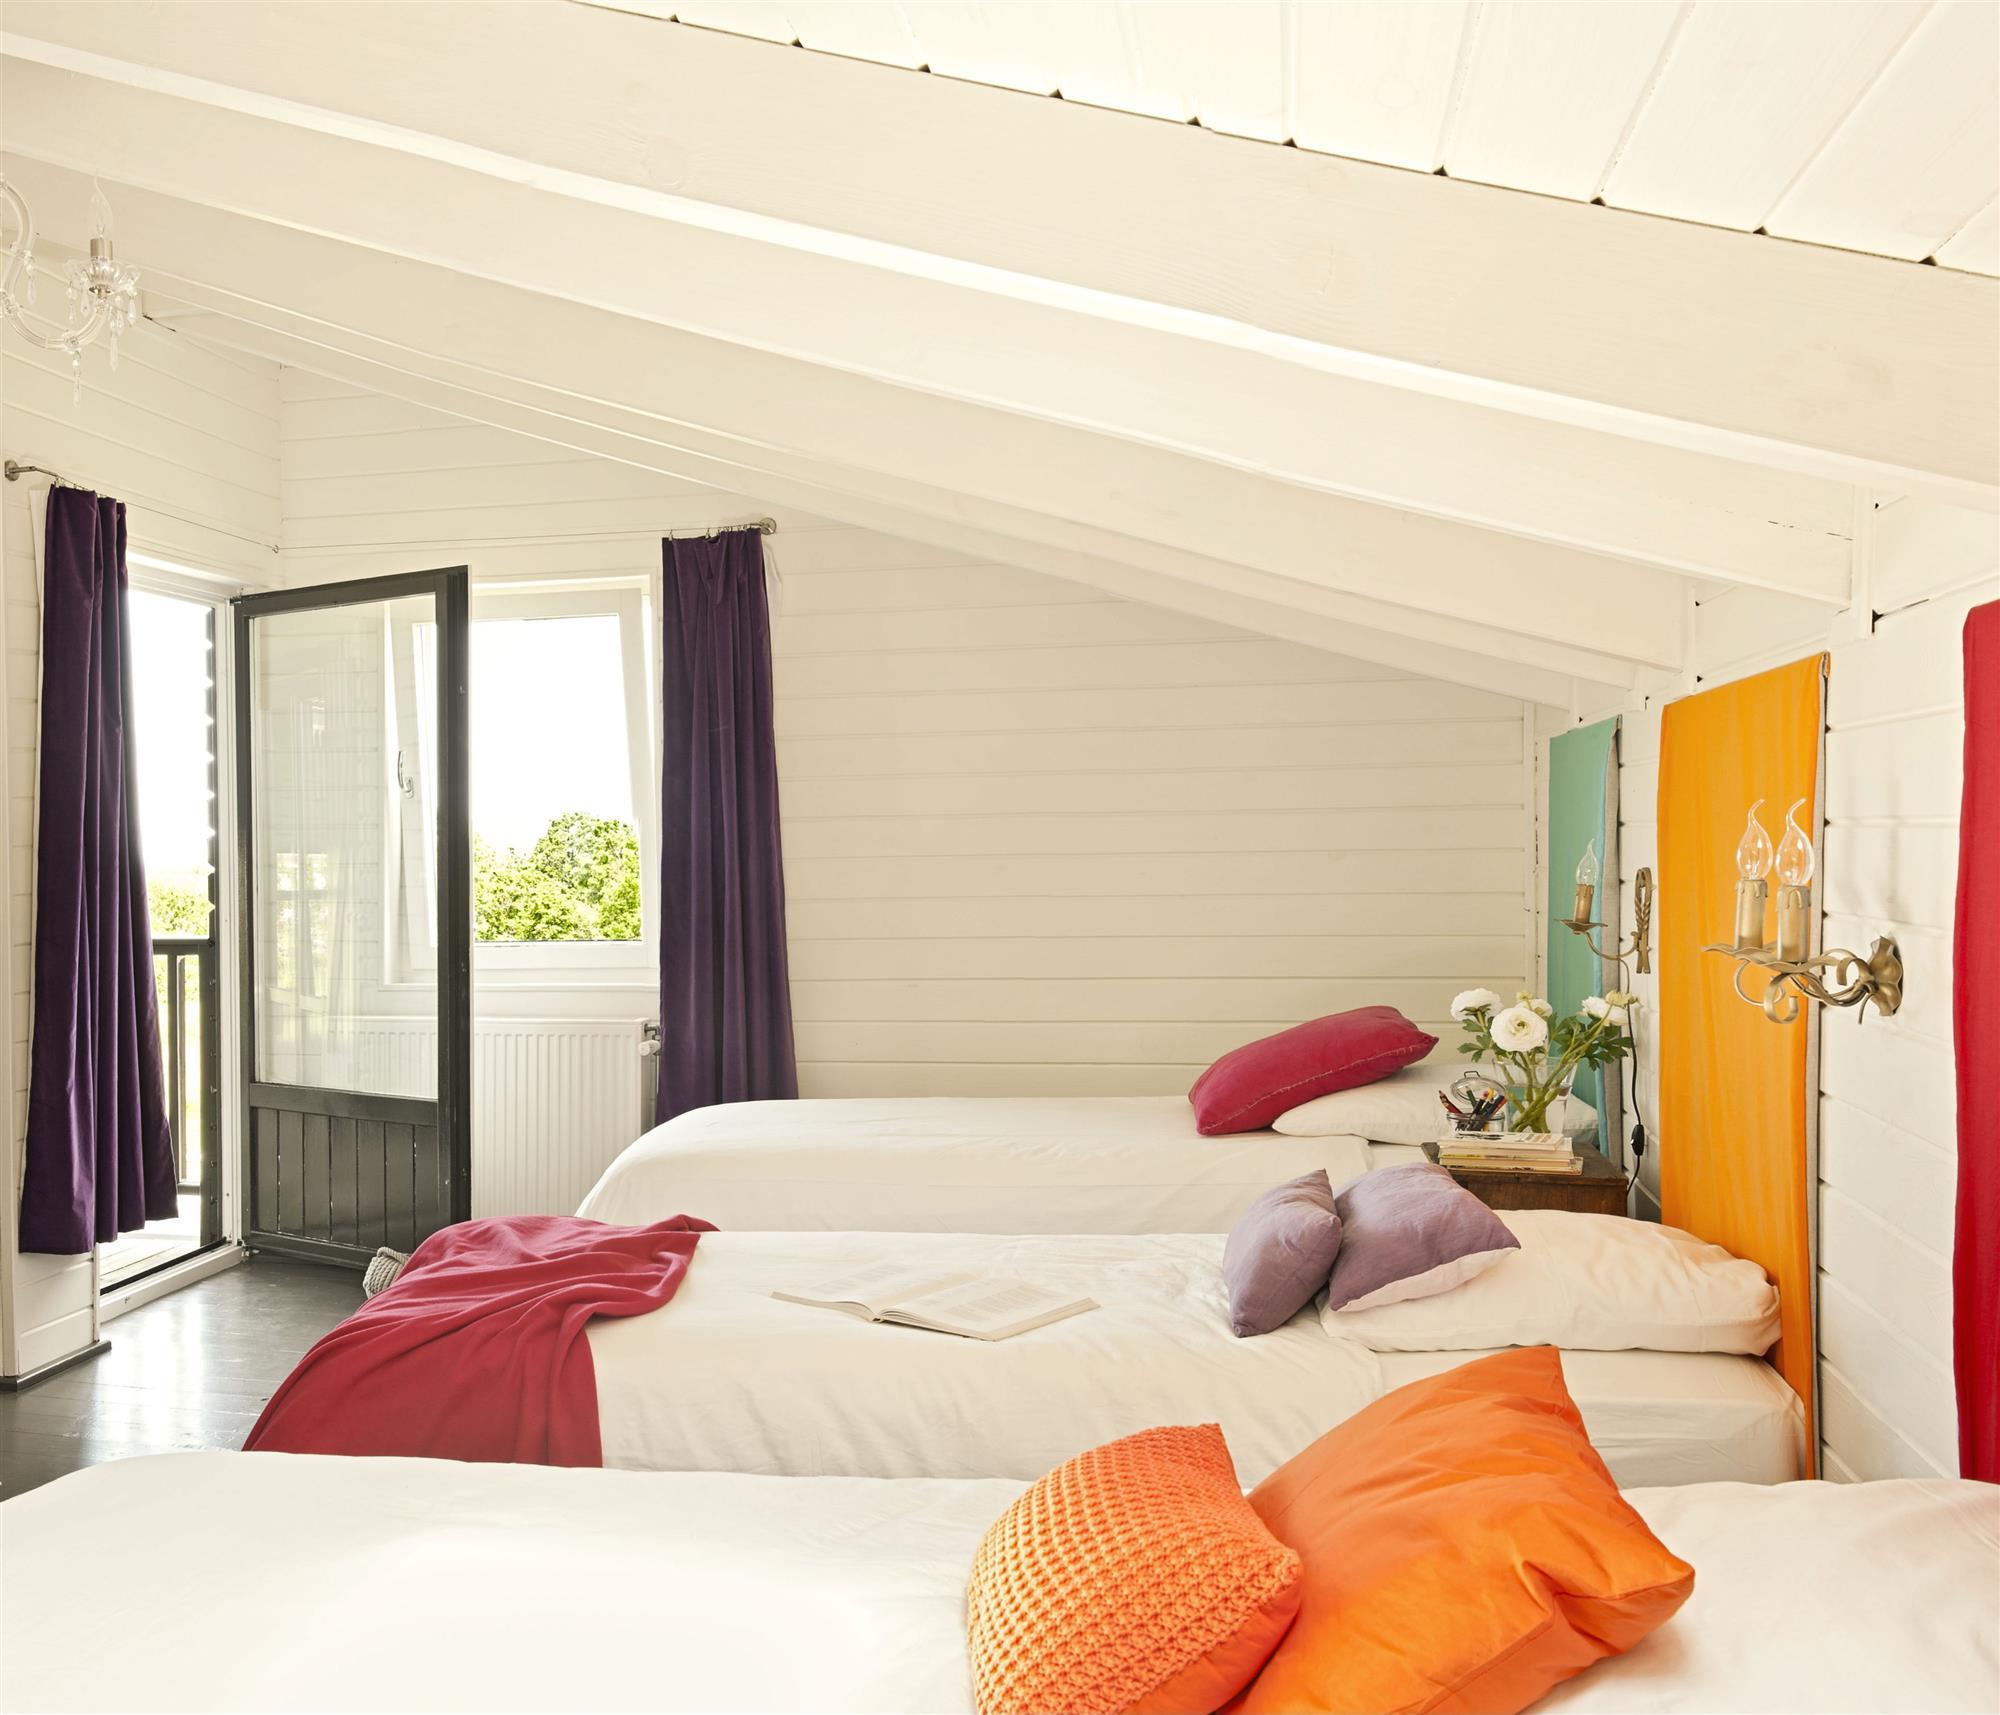 Color naranja el mueble - Cabeceros de tela ...